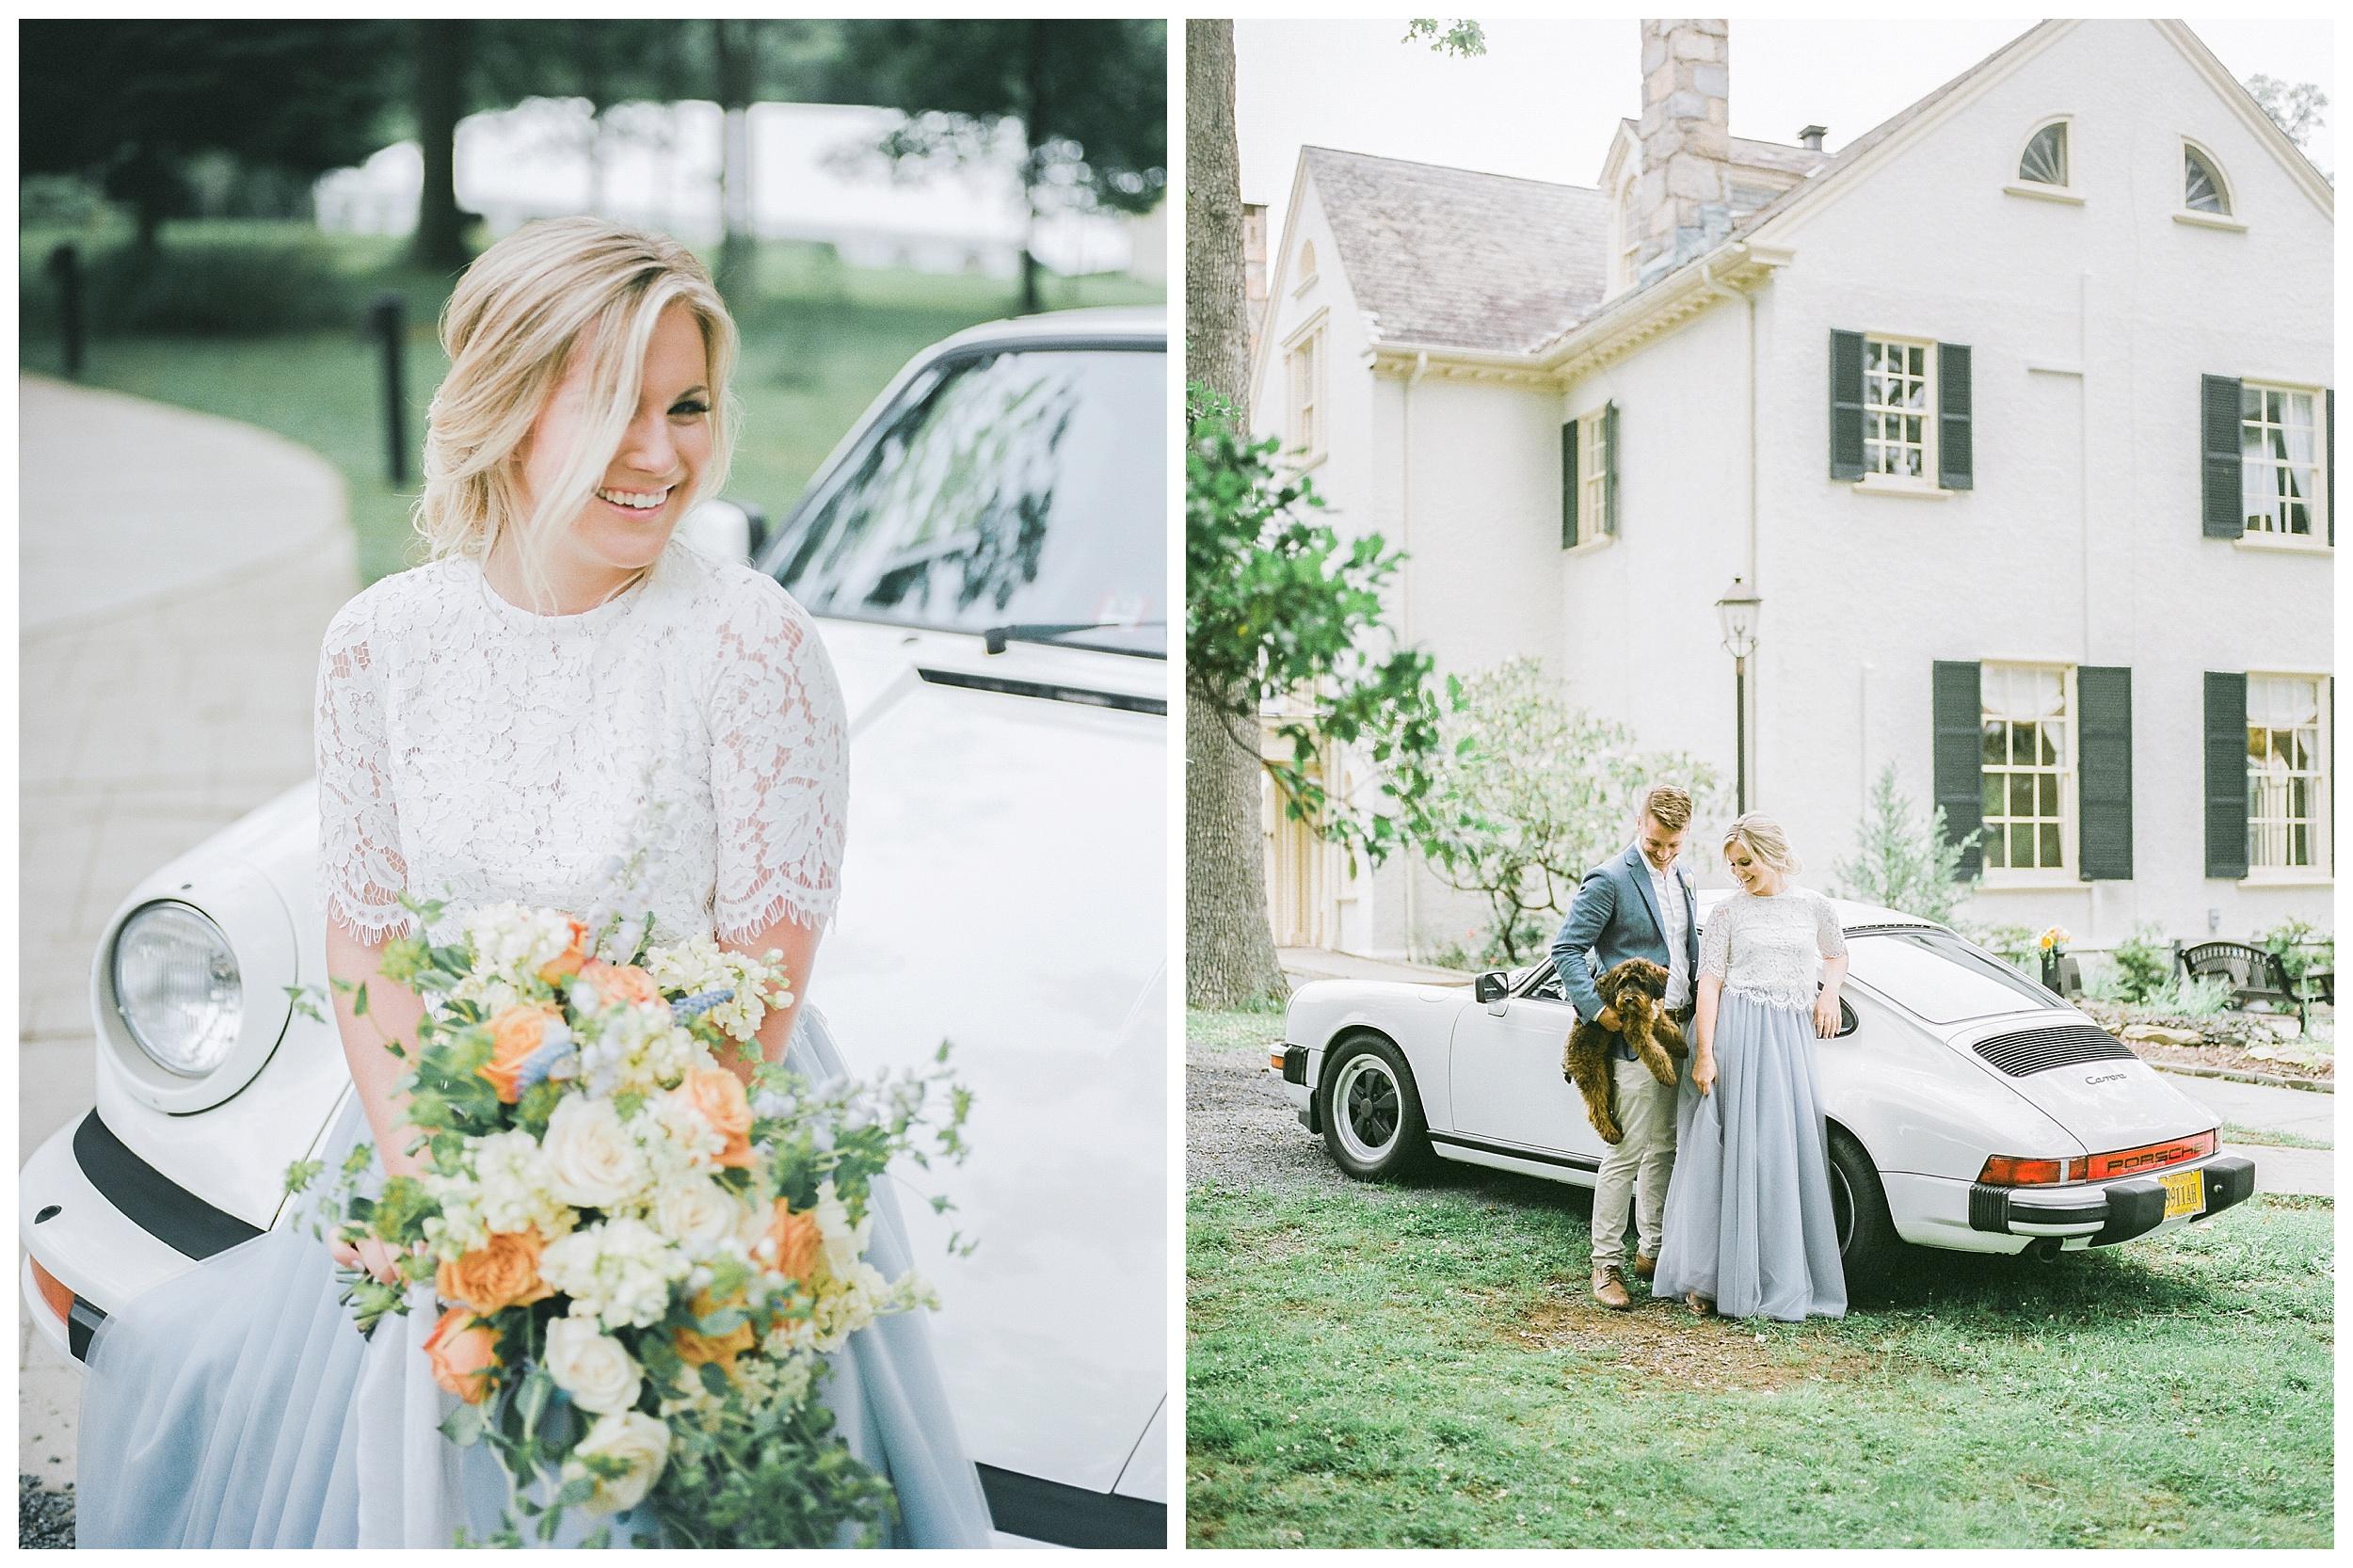 Rust Manor Wedding   Virginia Wedding Photographer Kir Tuben_0006.jpg